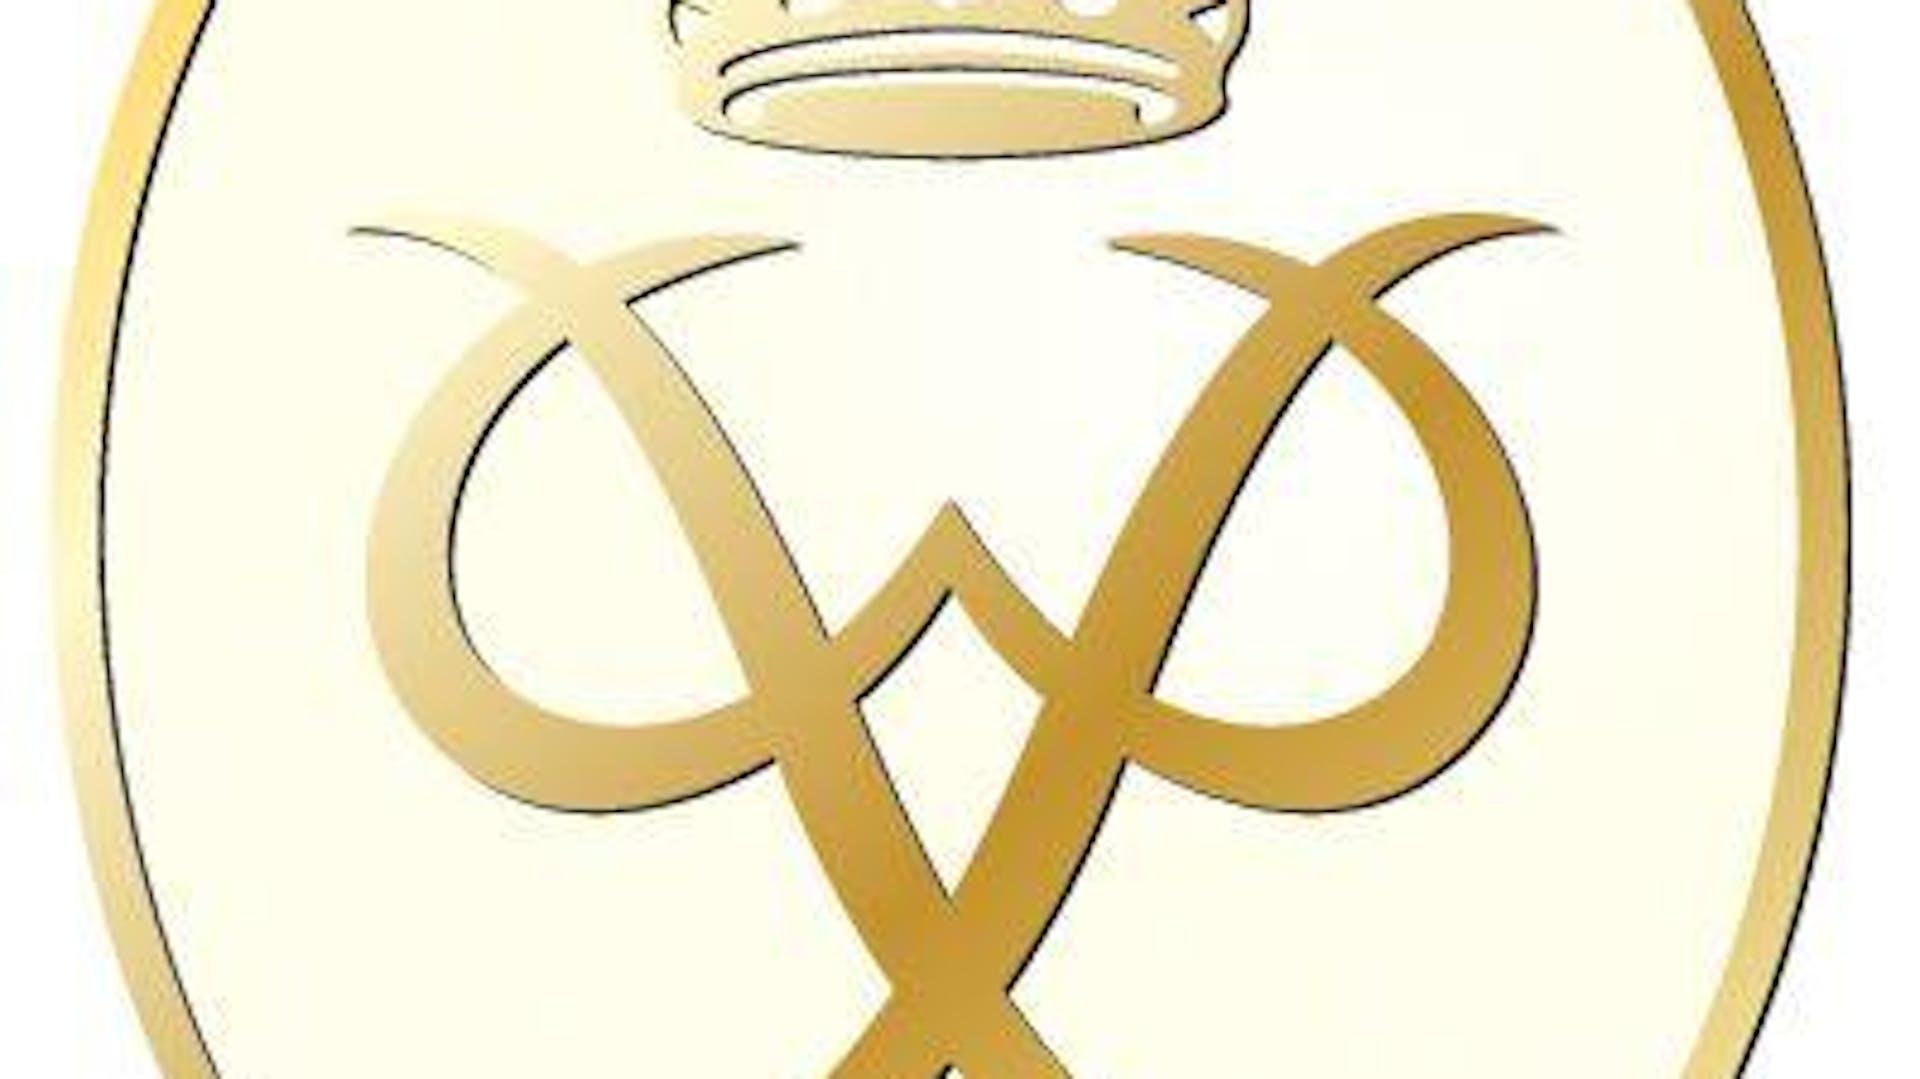 Gold dofe badge